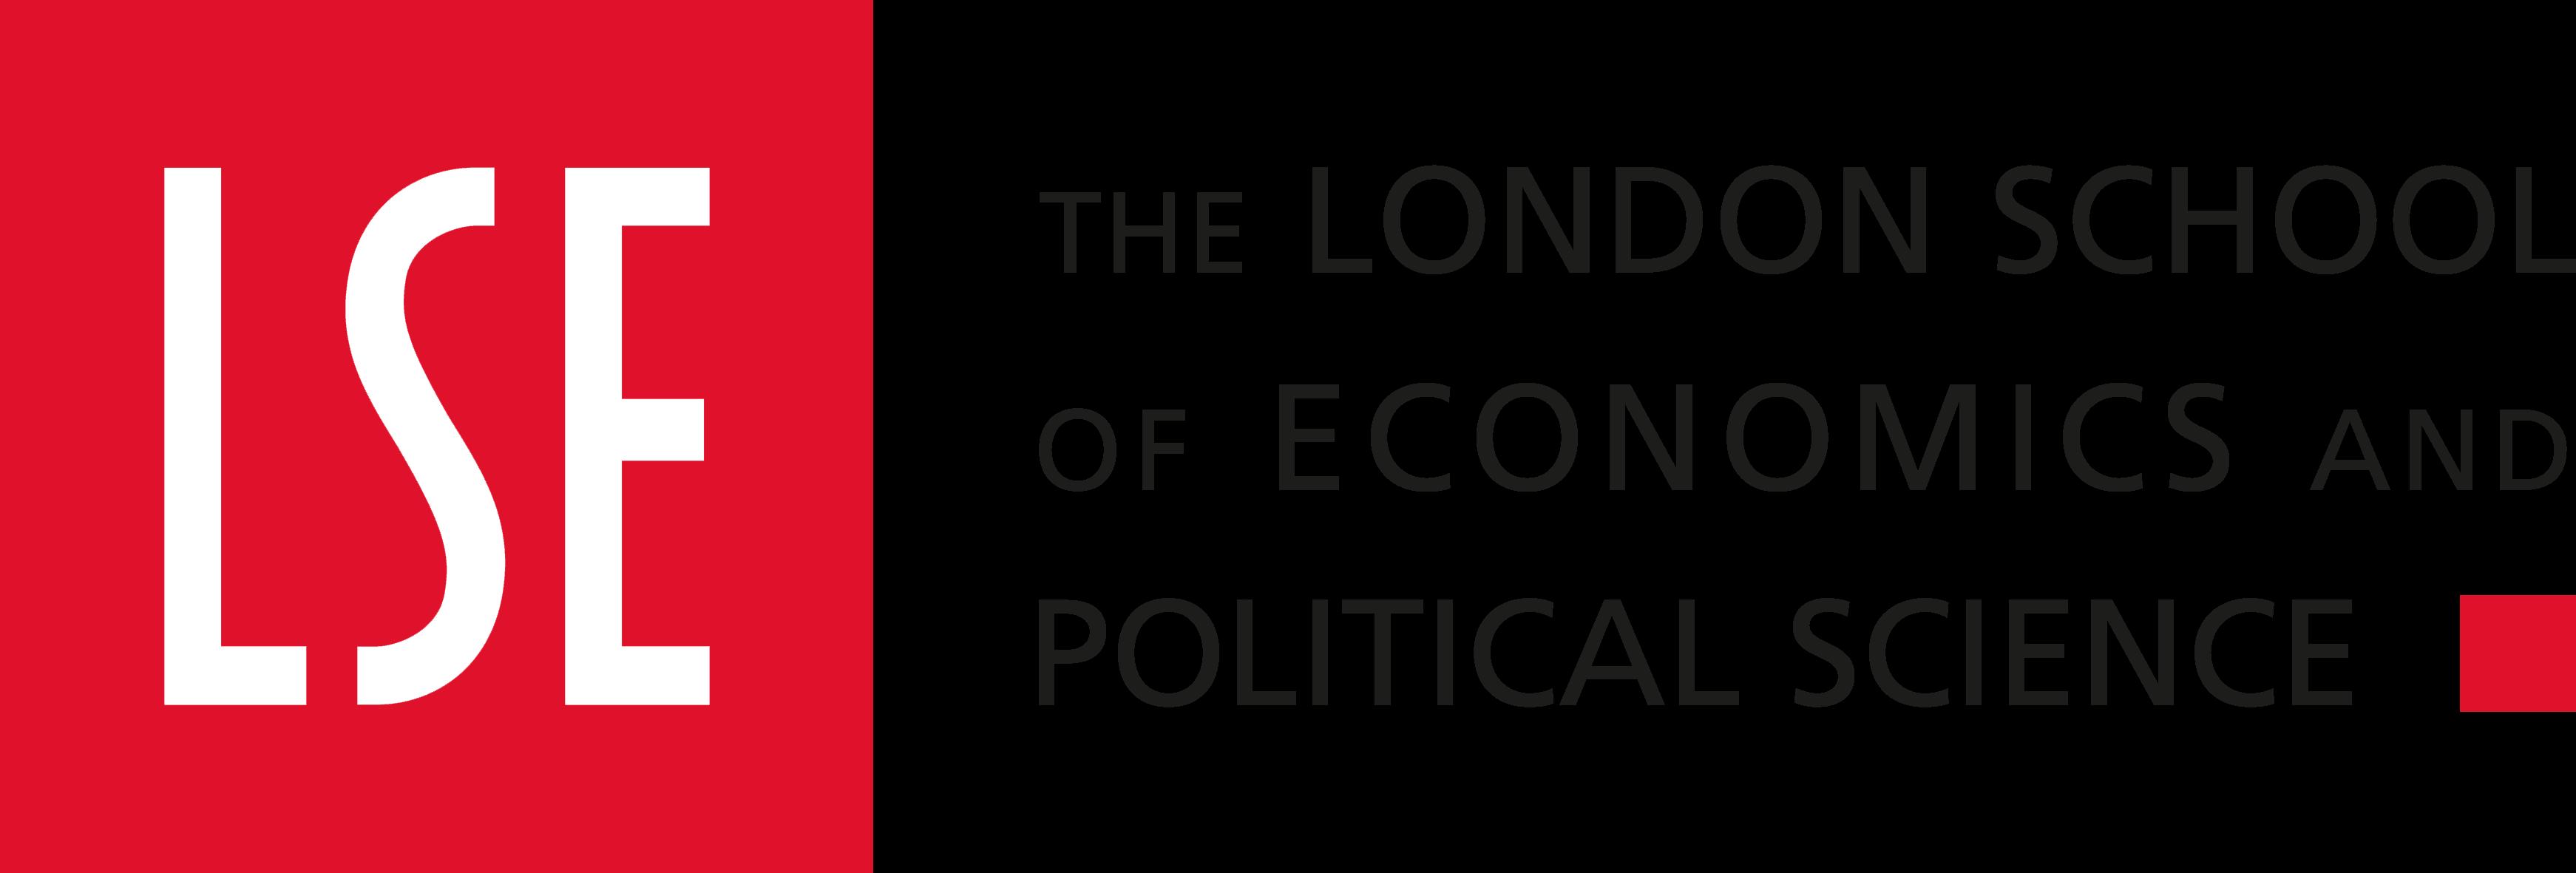 LSE Logo 2